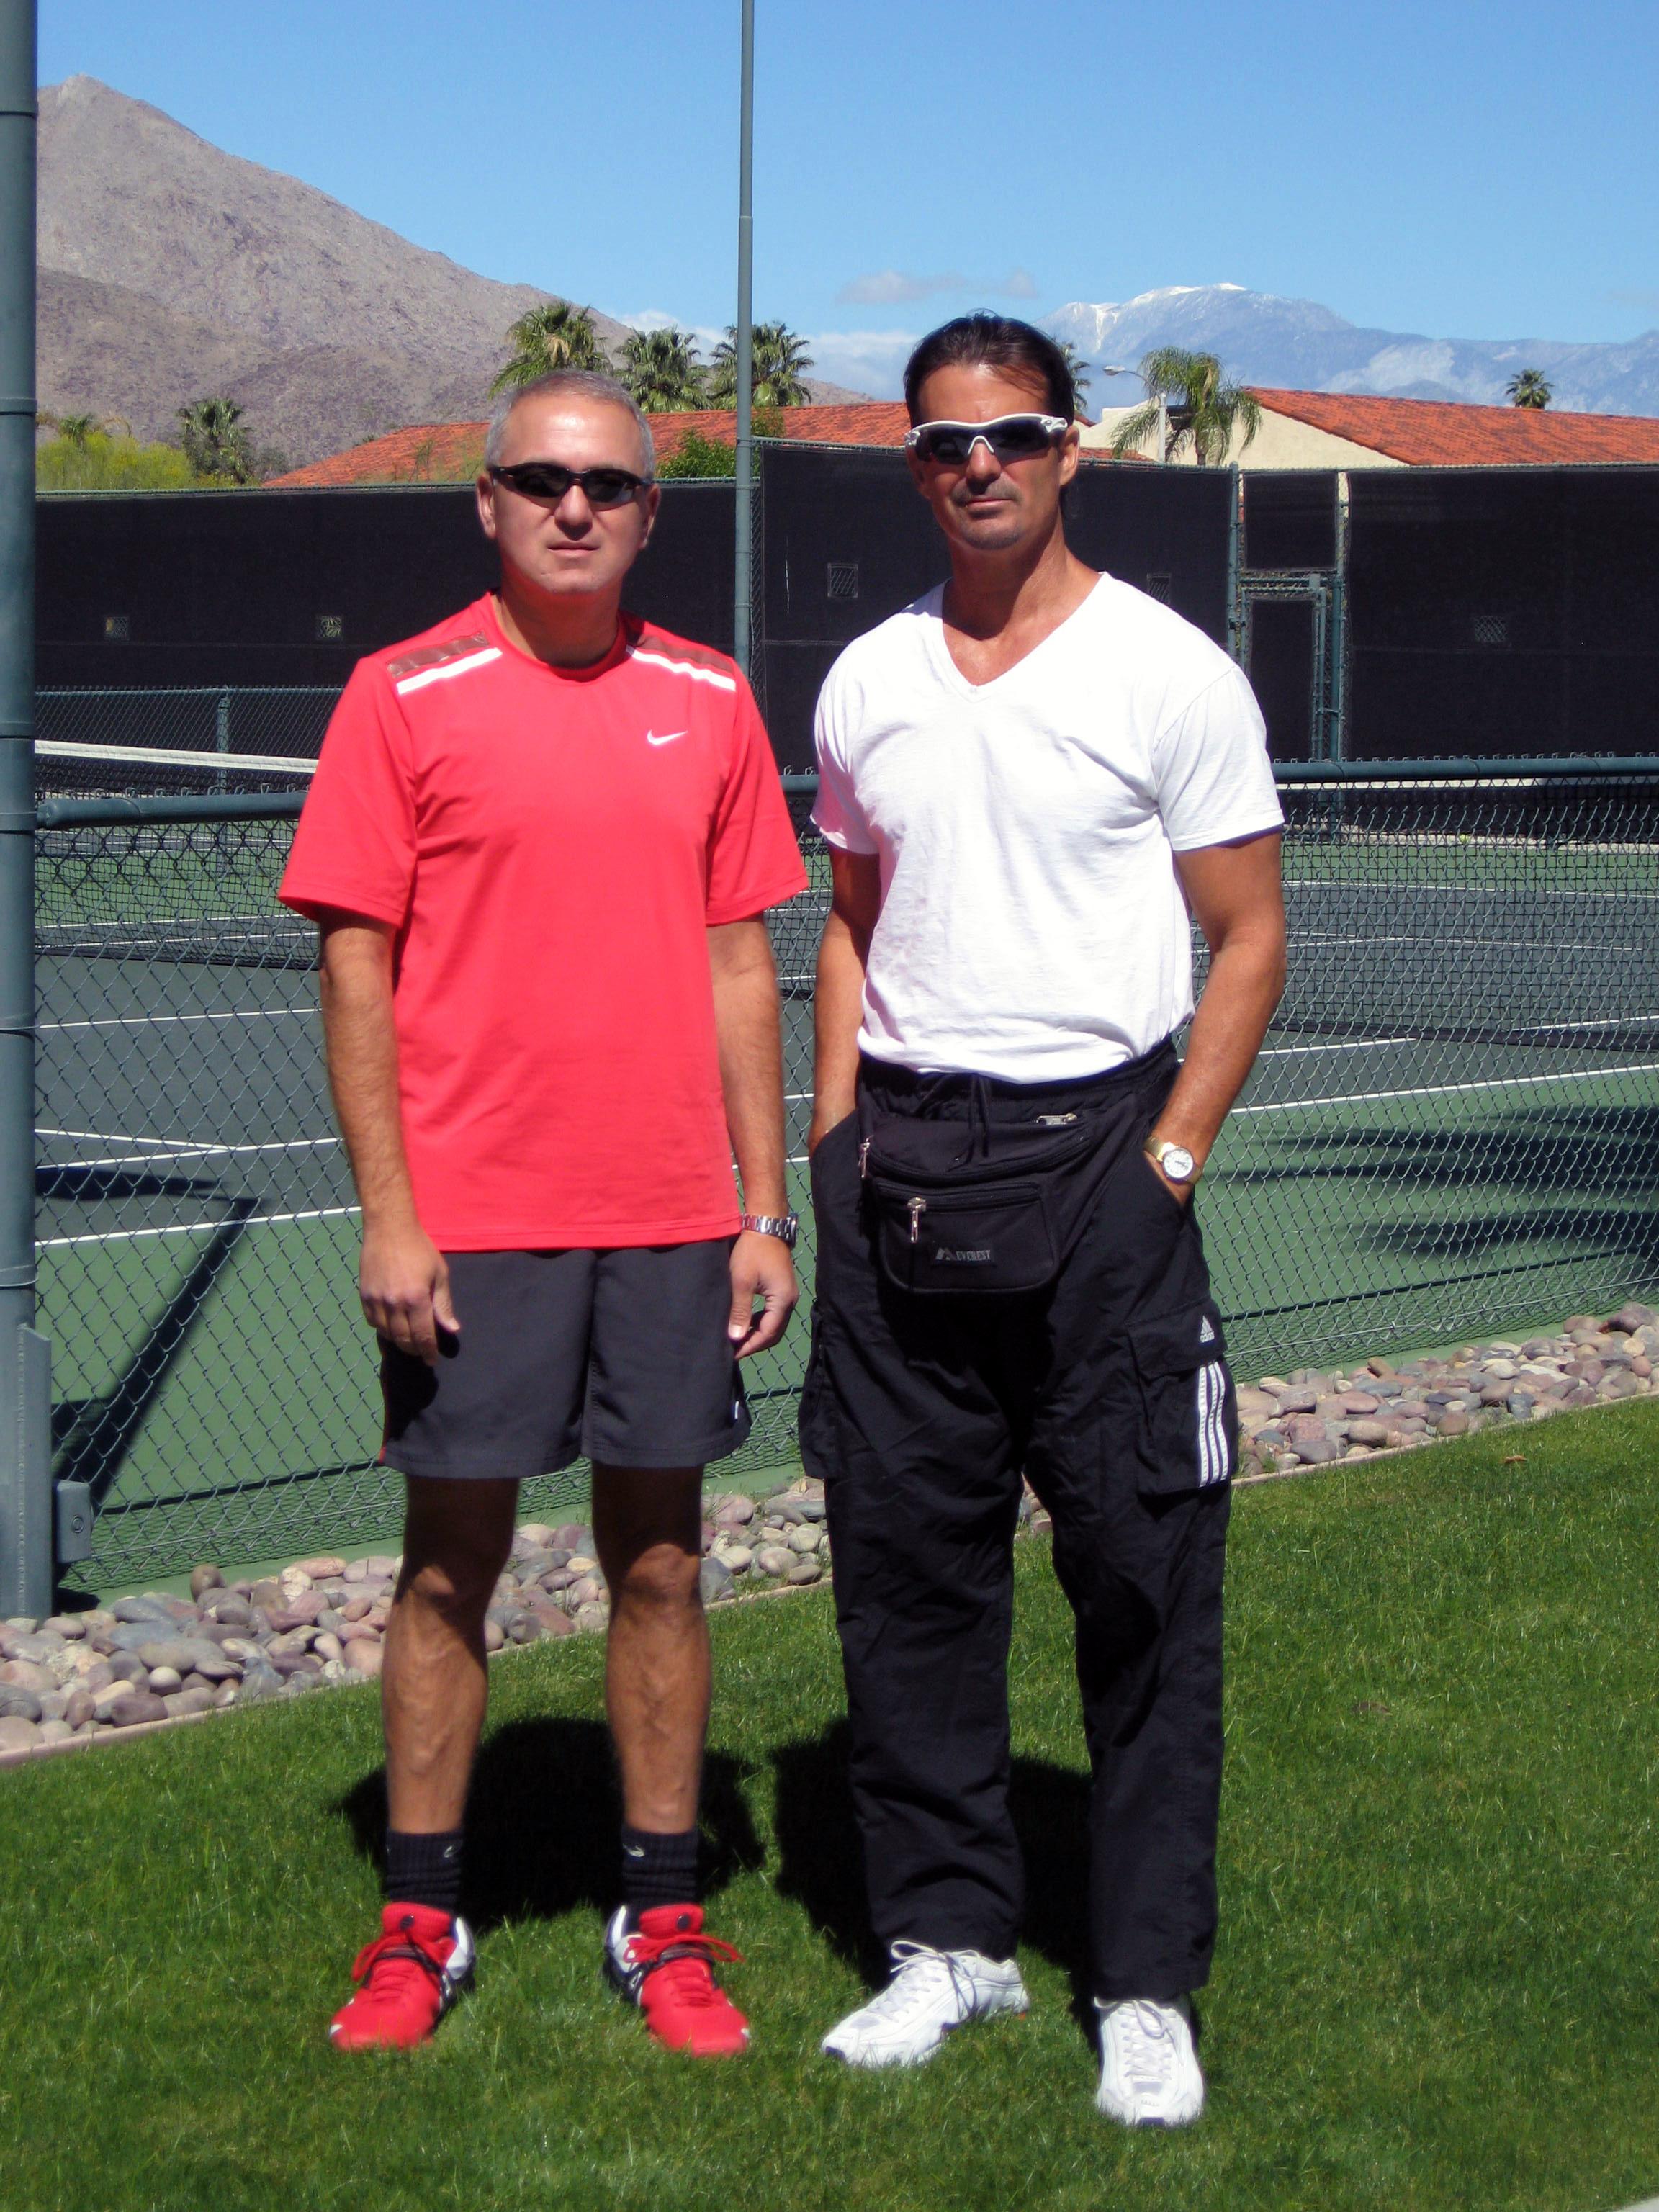 Singles Finalists Photos – 2012 Plaza Racquet Club Singles Championships